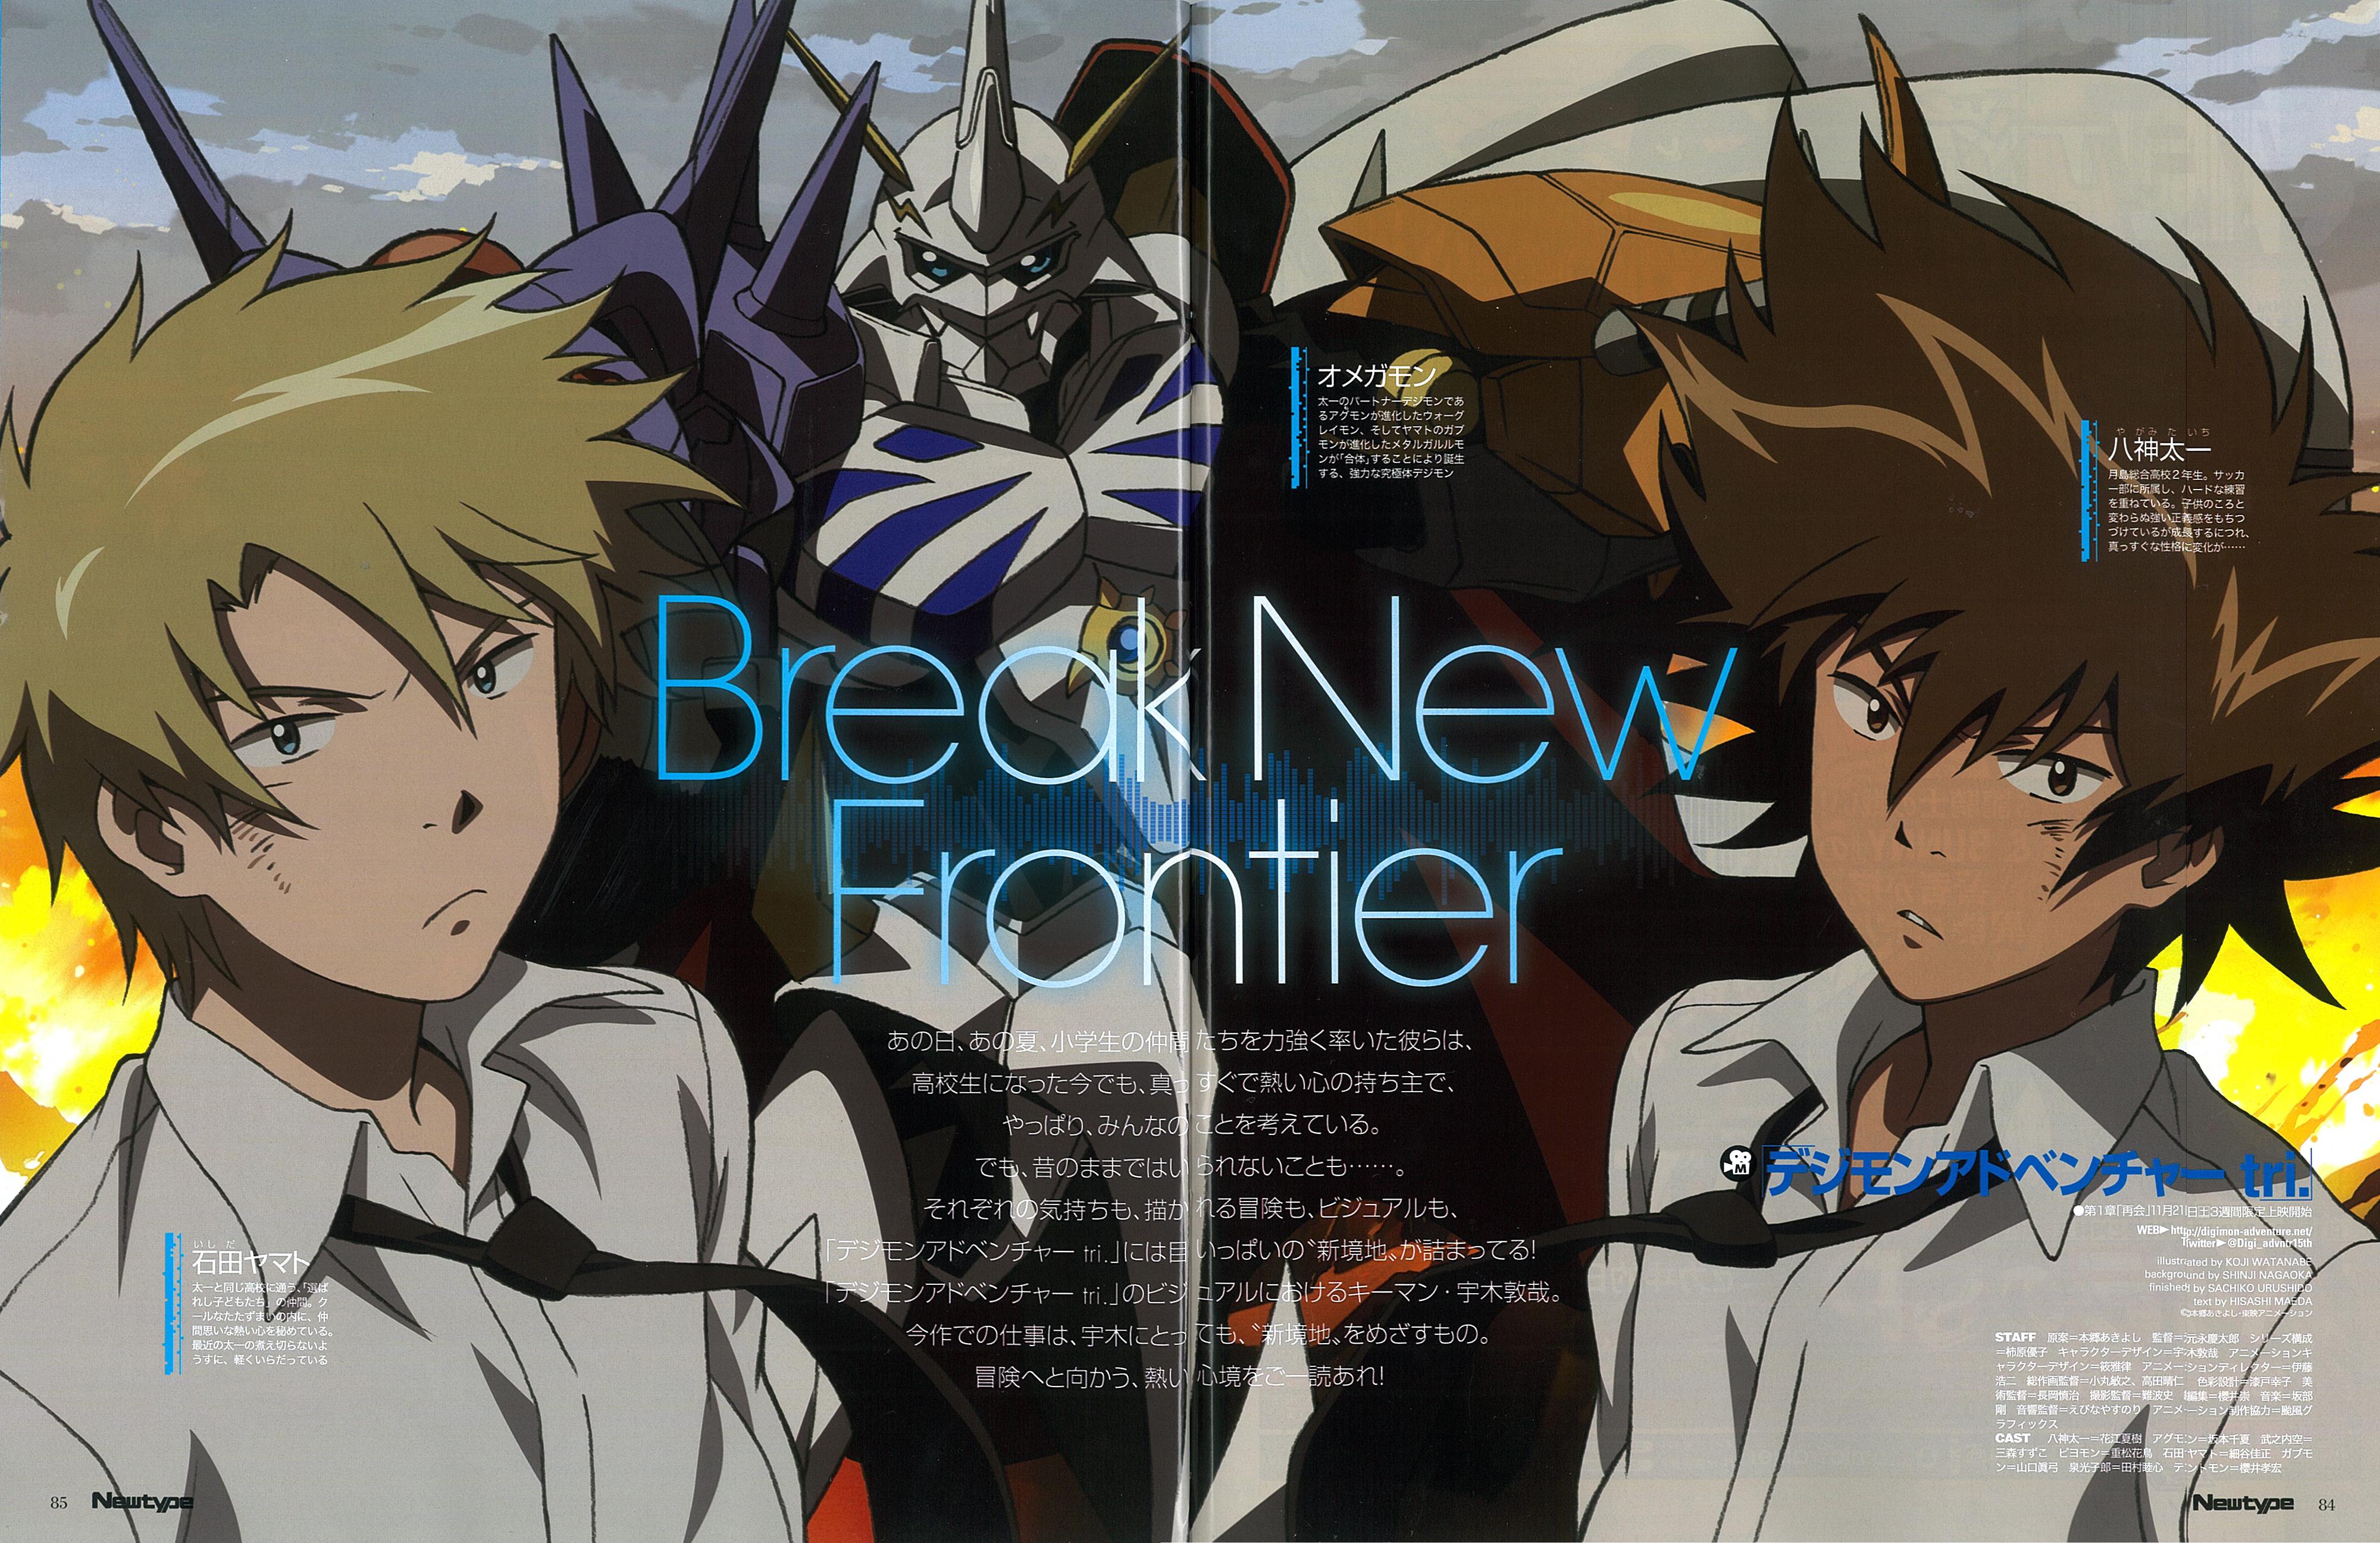 Digimon Adventure Tri. Poster Visuals NewType December 2015 issue